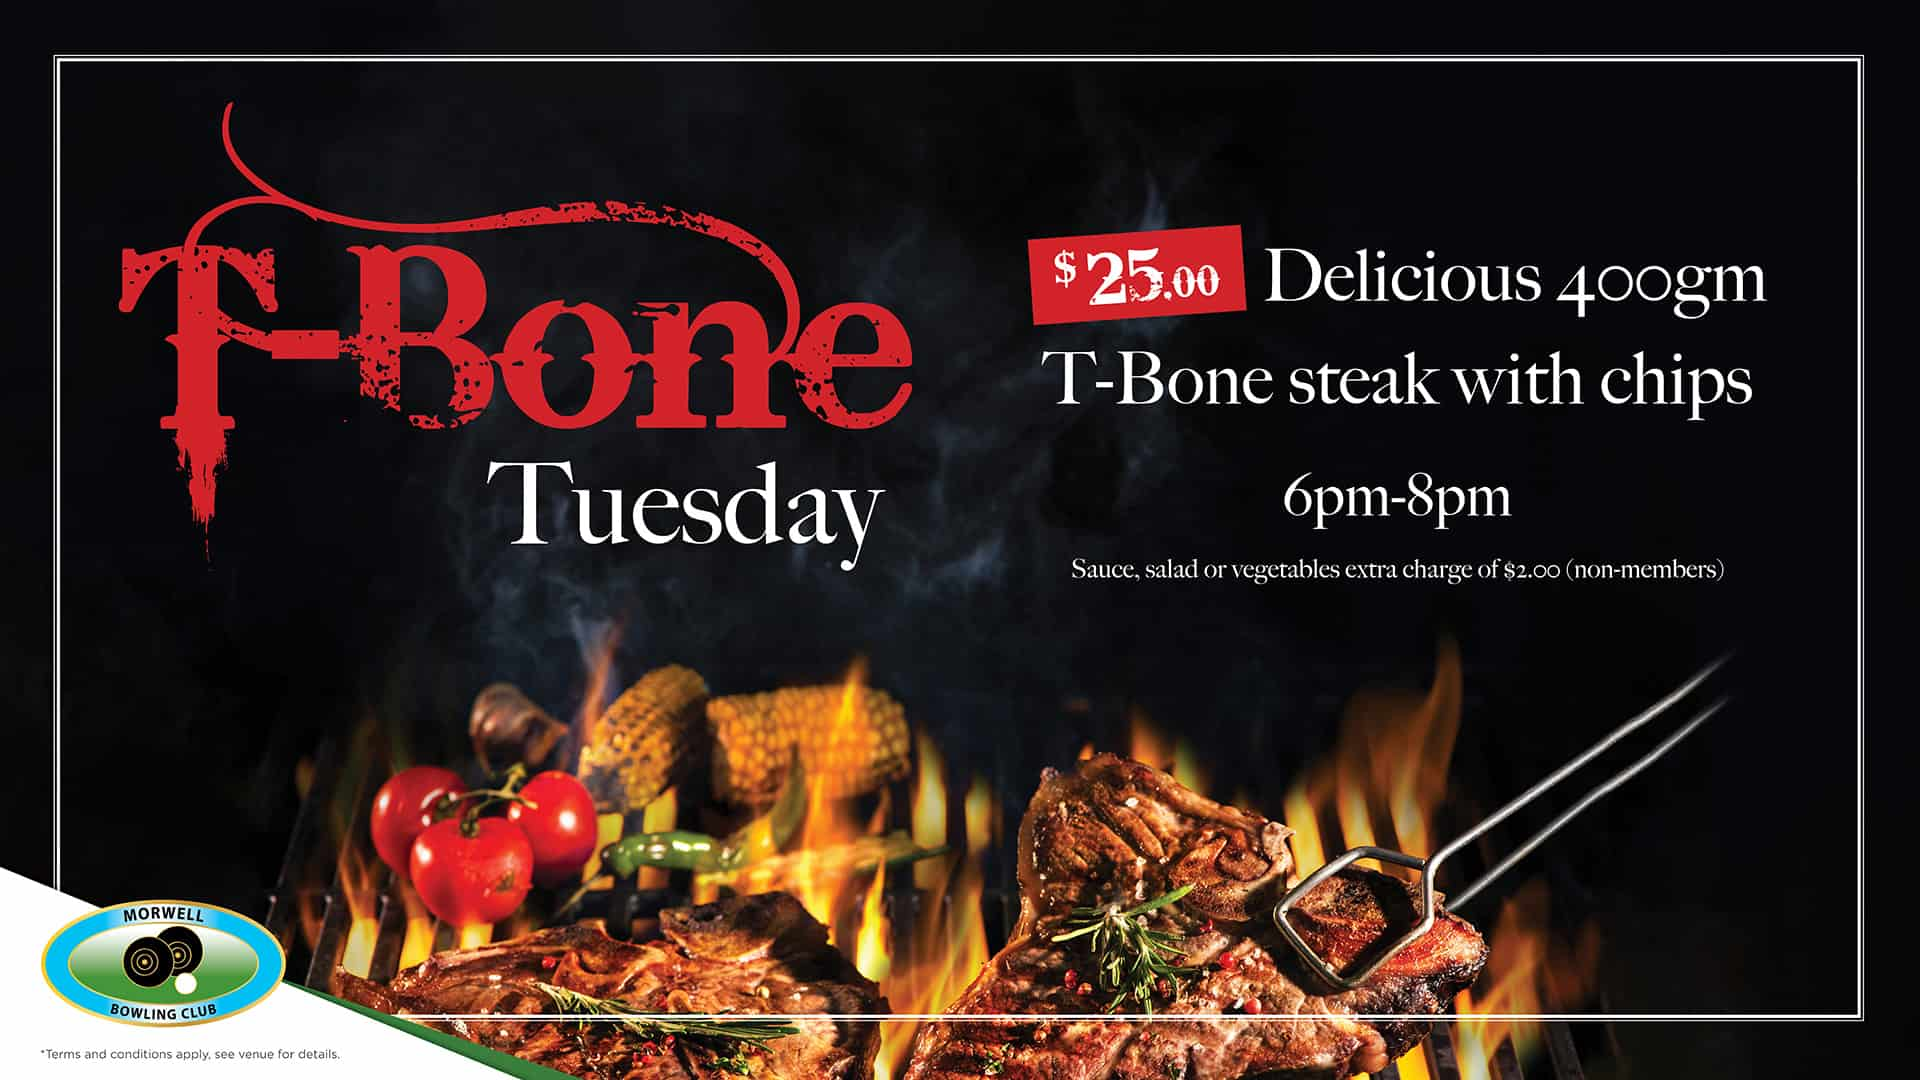 MBC0720-01_T-Bone Tuesday_HDTV_V3